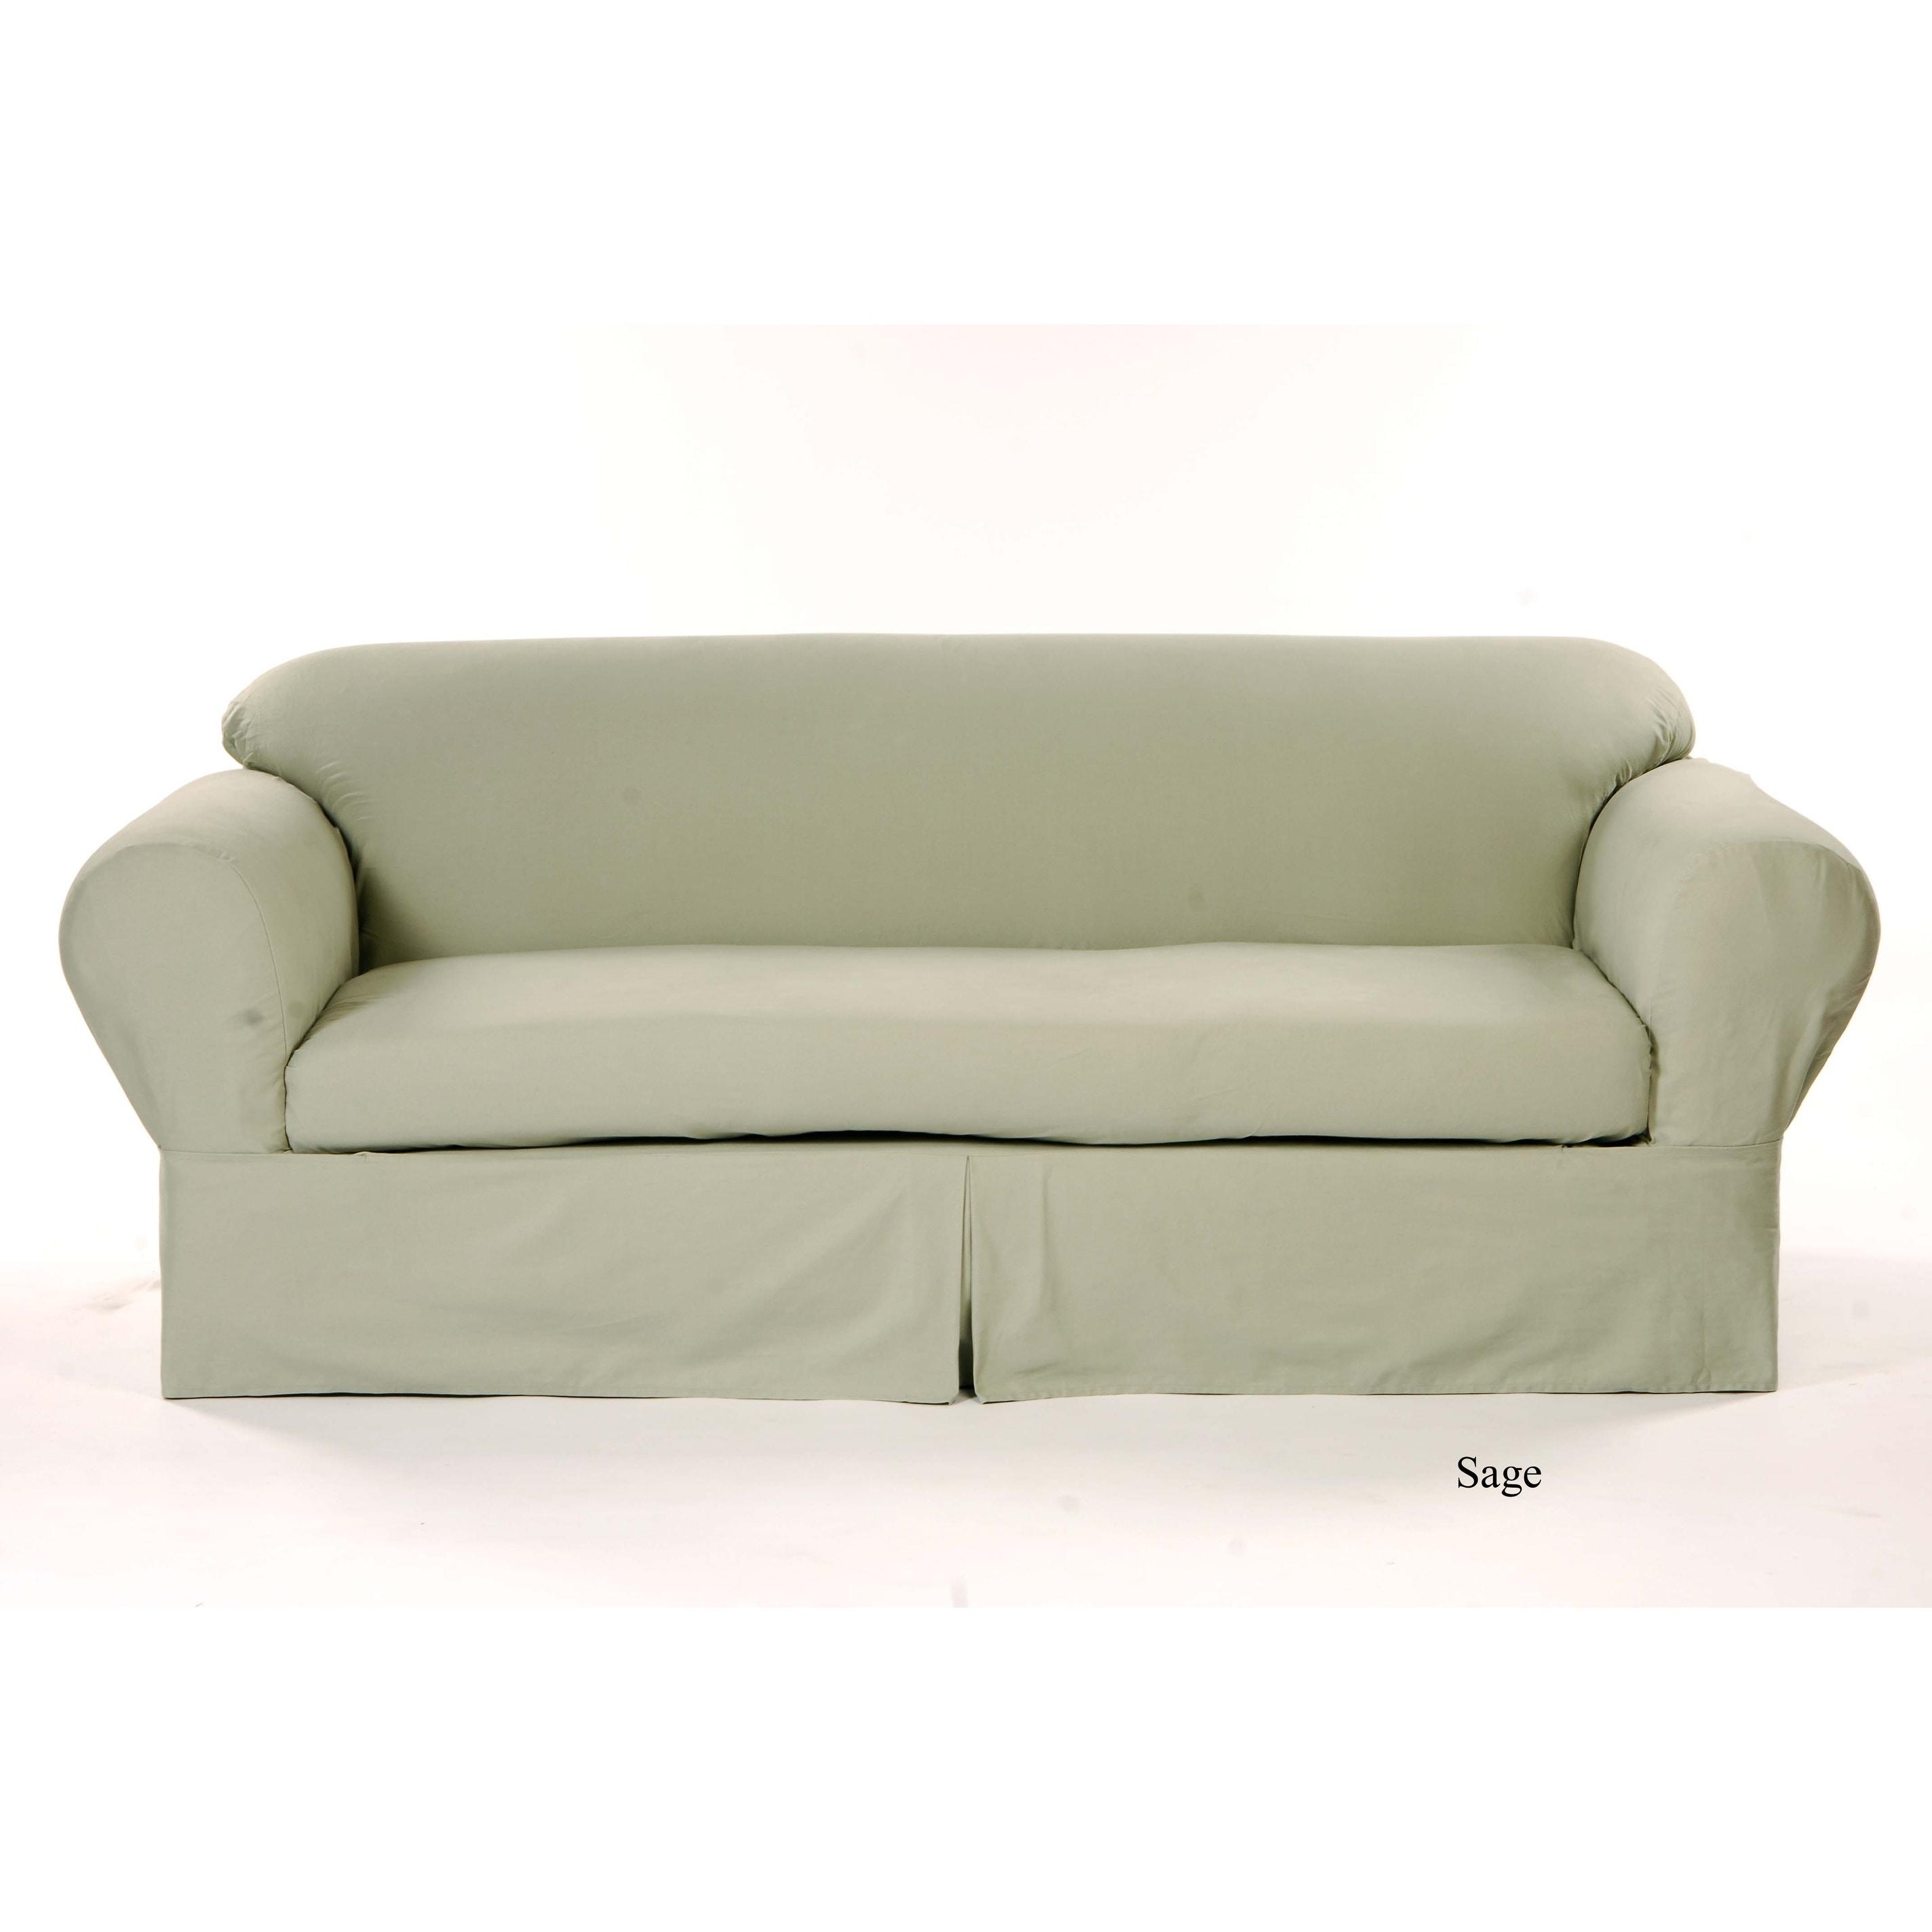 Clic Slipcovers 2 Piece Twill Sofa Slipcover On Free Shipping Today 7358756